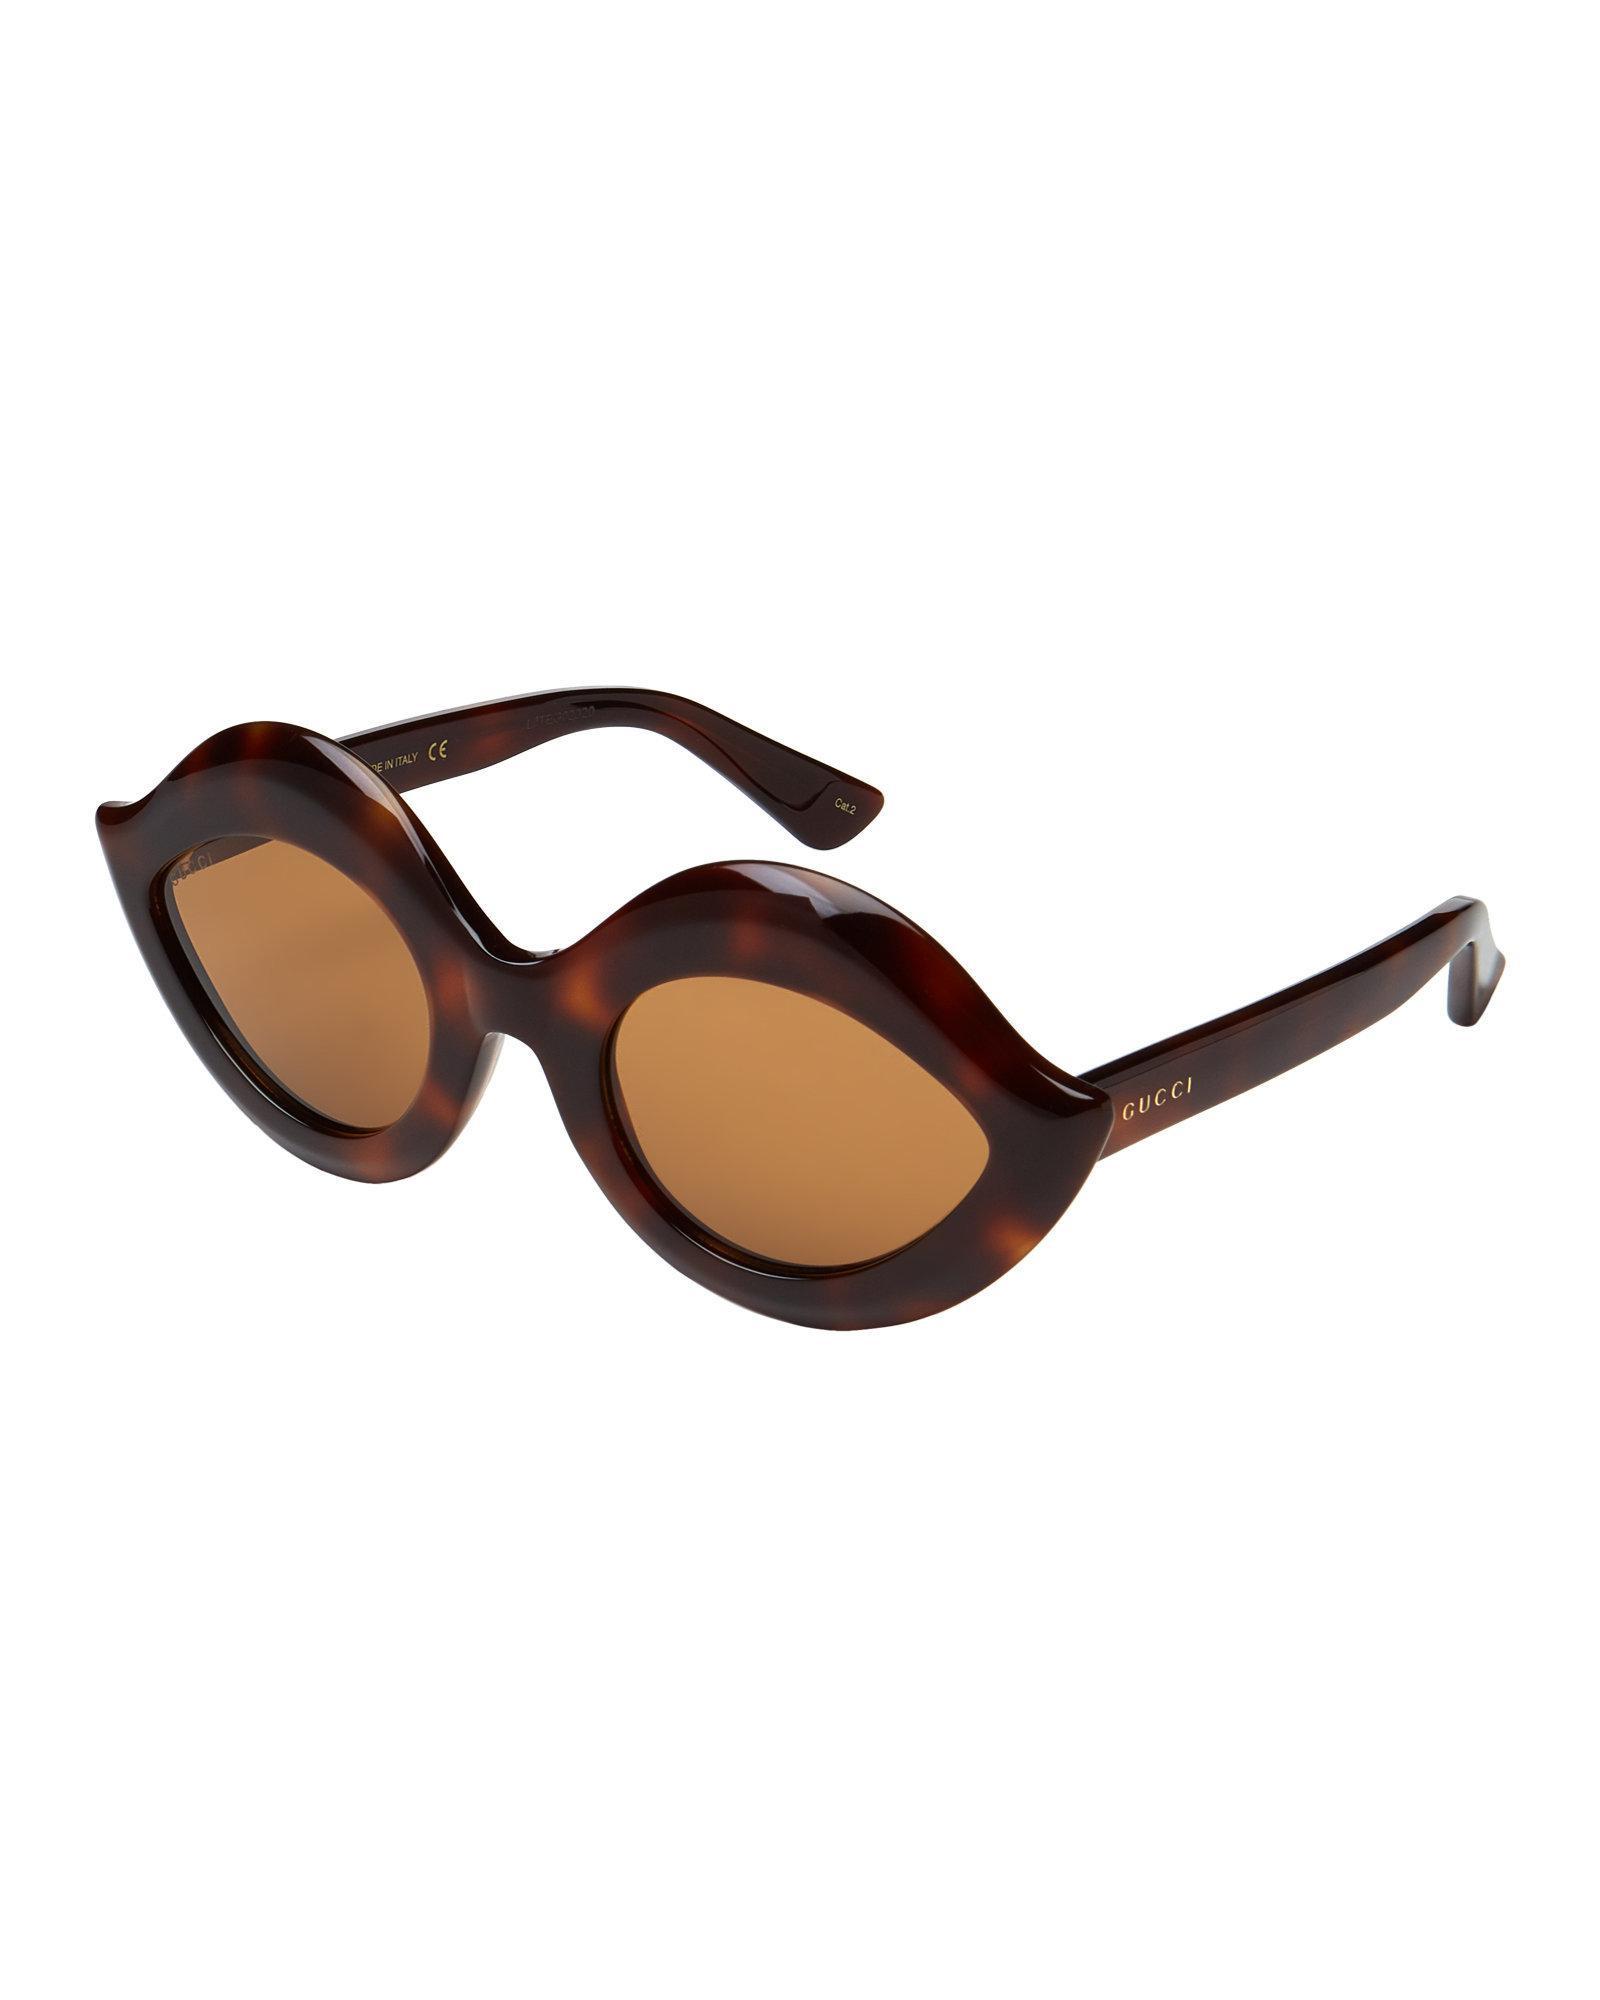 dc4b1e1ac82 Lyst - Gucci Gg 0085 s Tortoiseshell-look Lip-inspired Sunglasses in ...